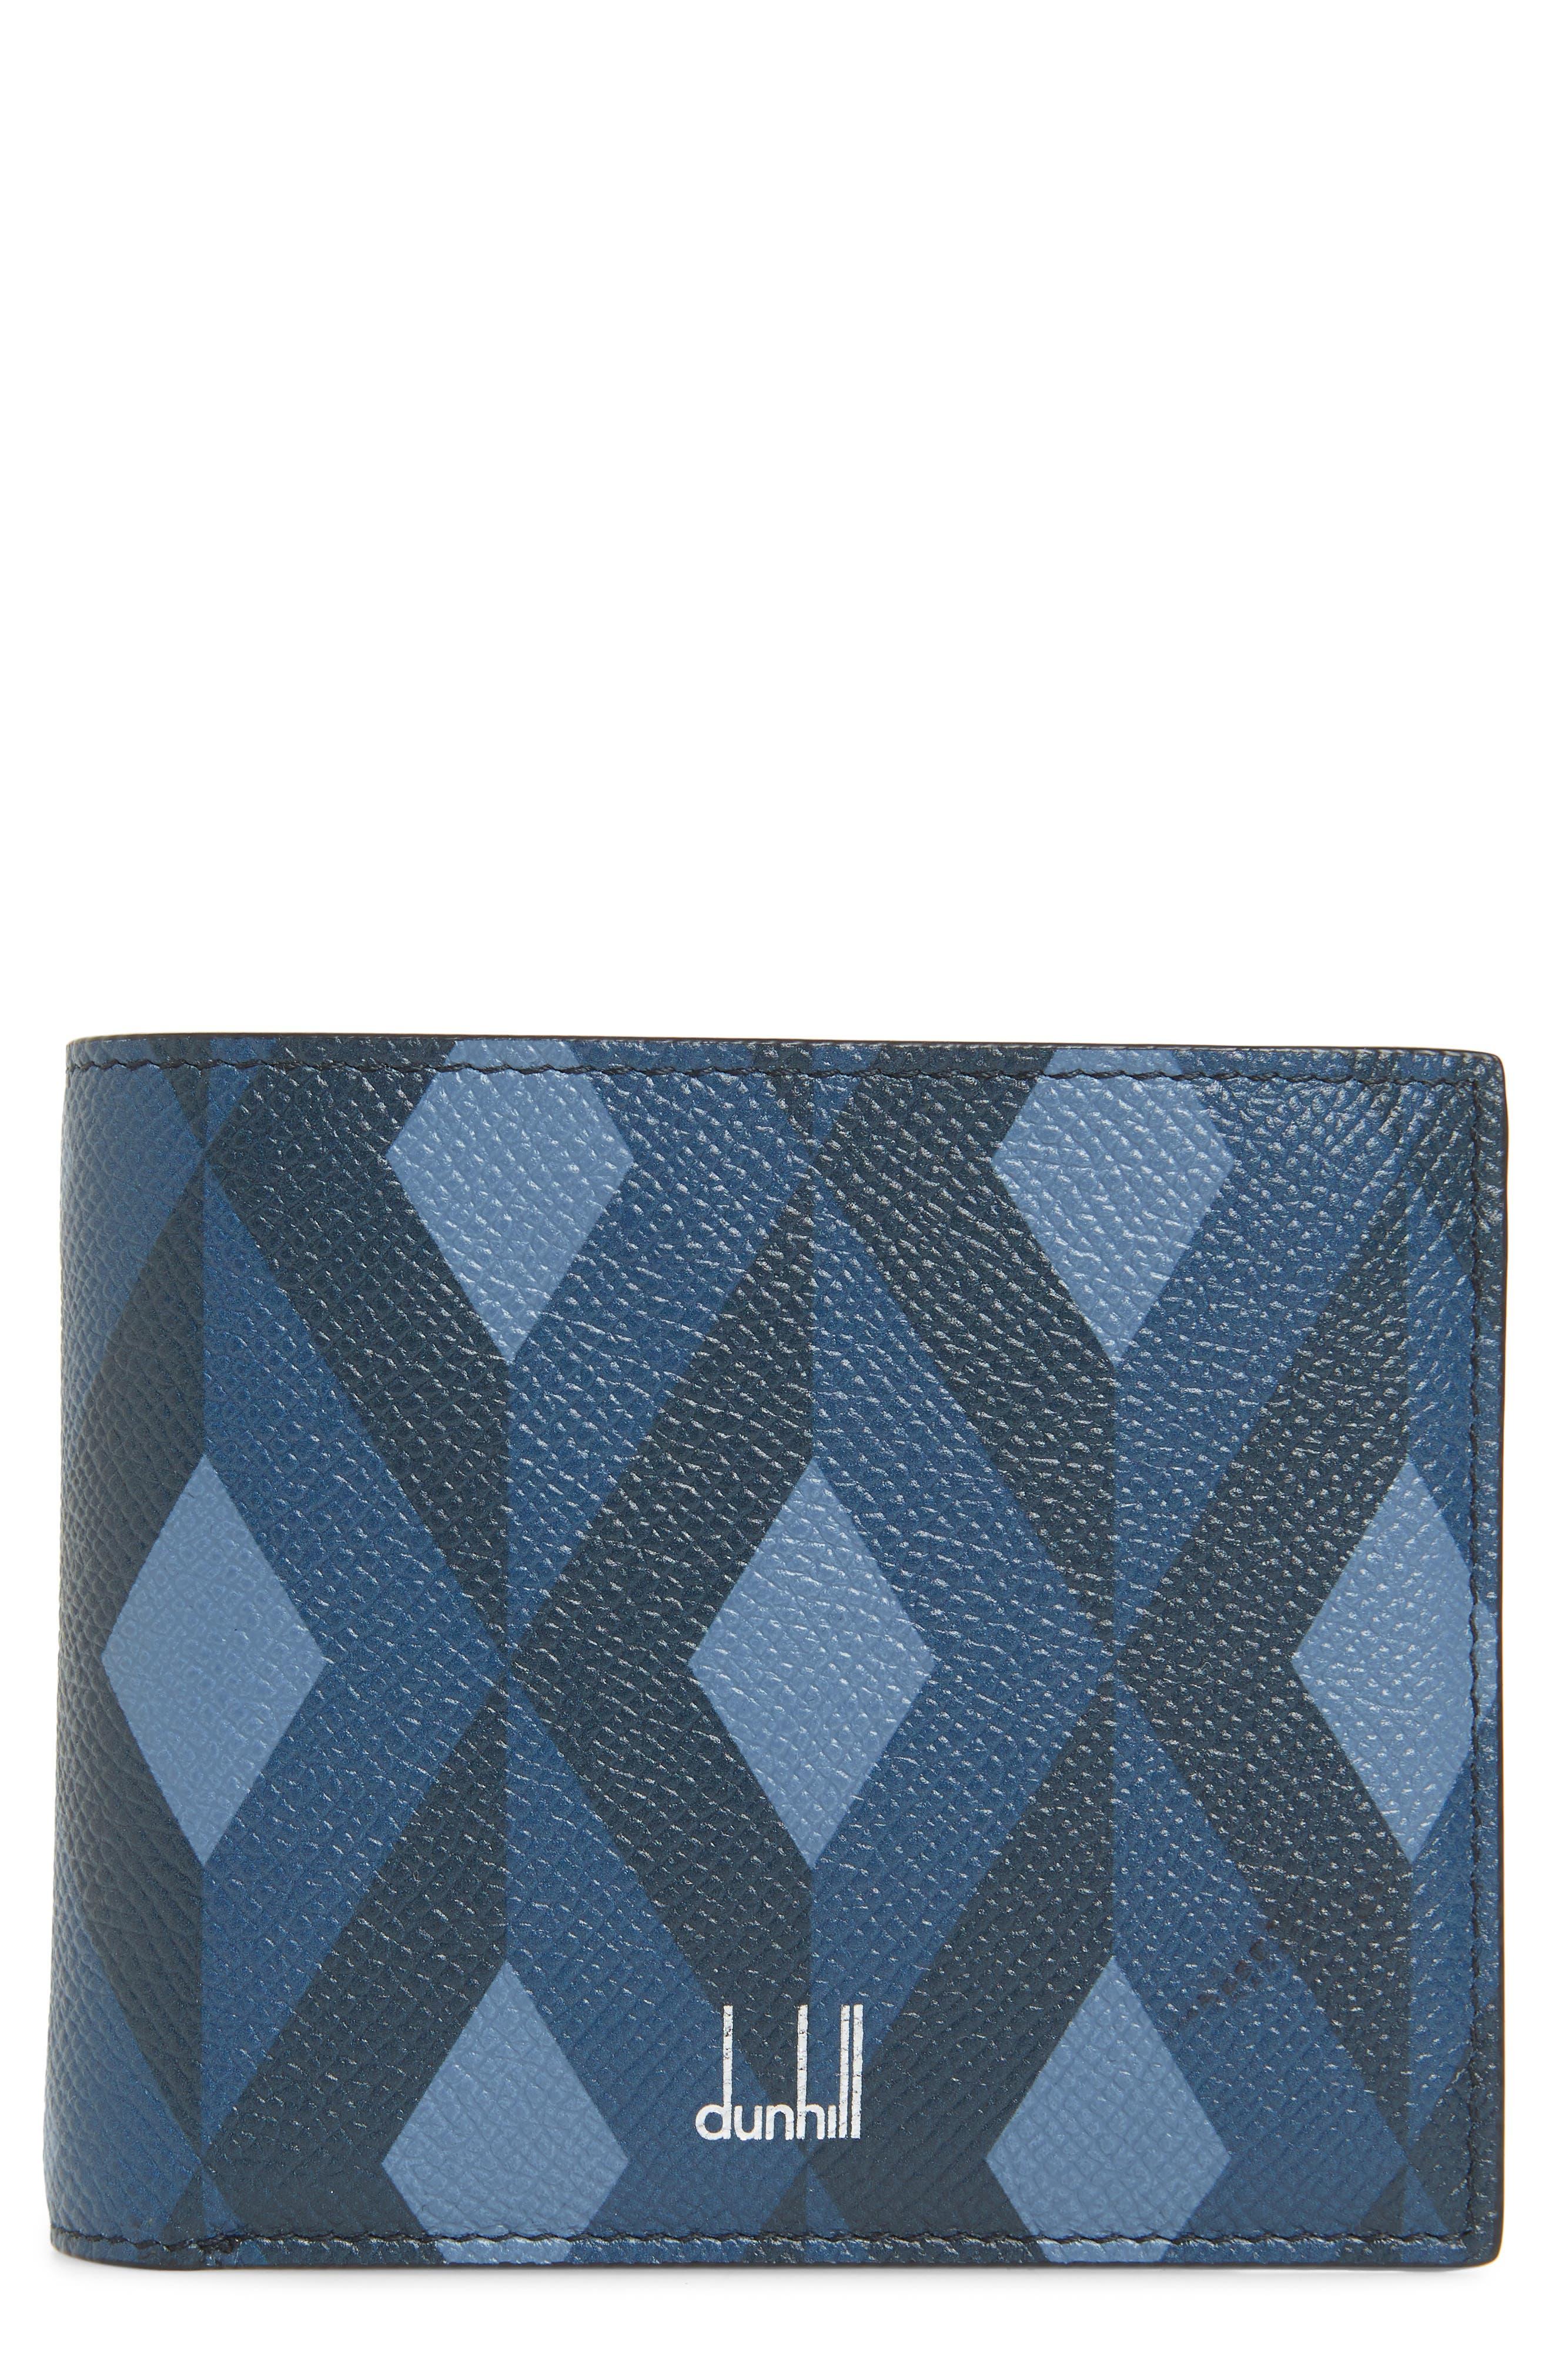 Cadogan Leather Wallet,                         Main,                         color, BLUE